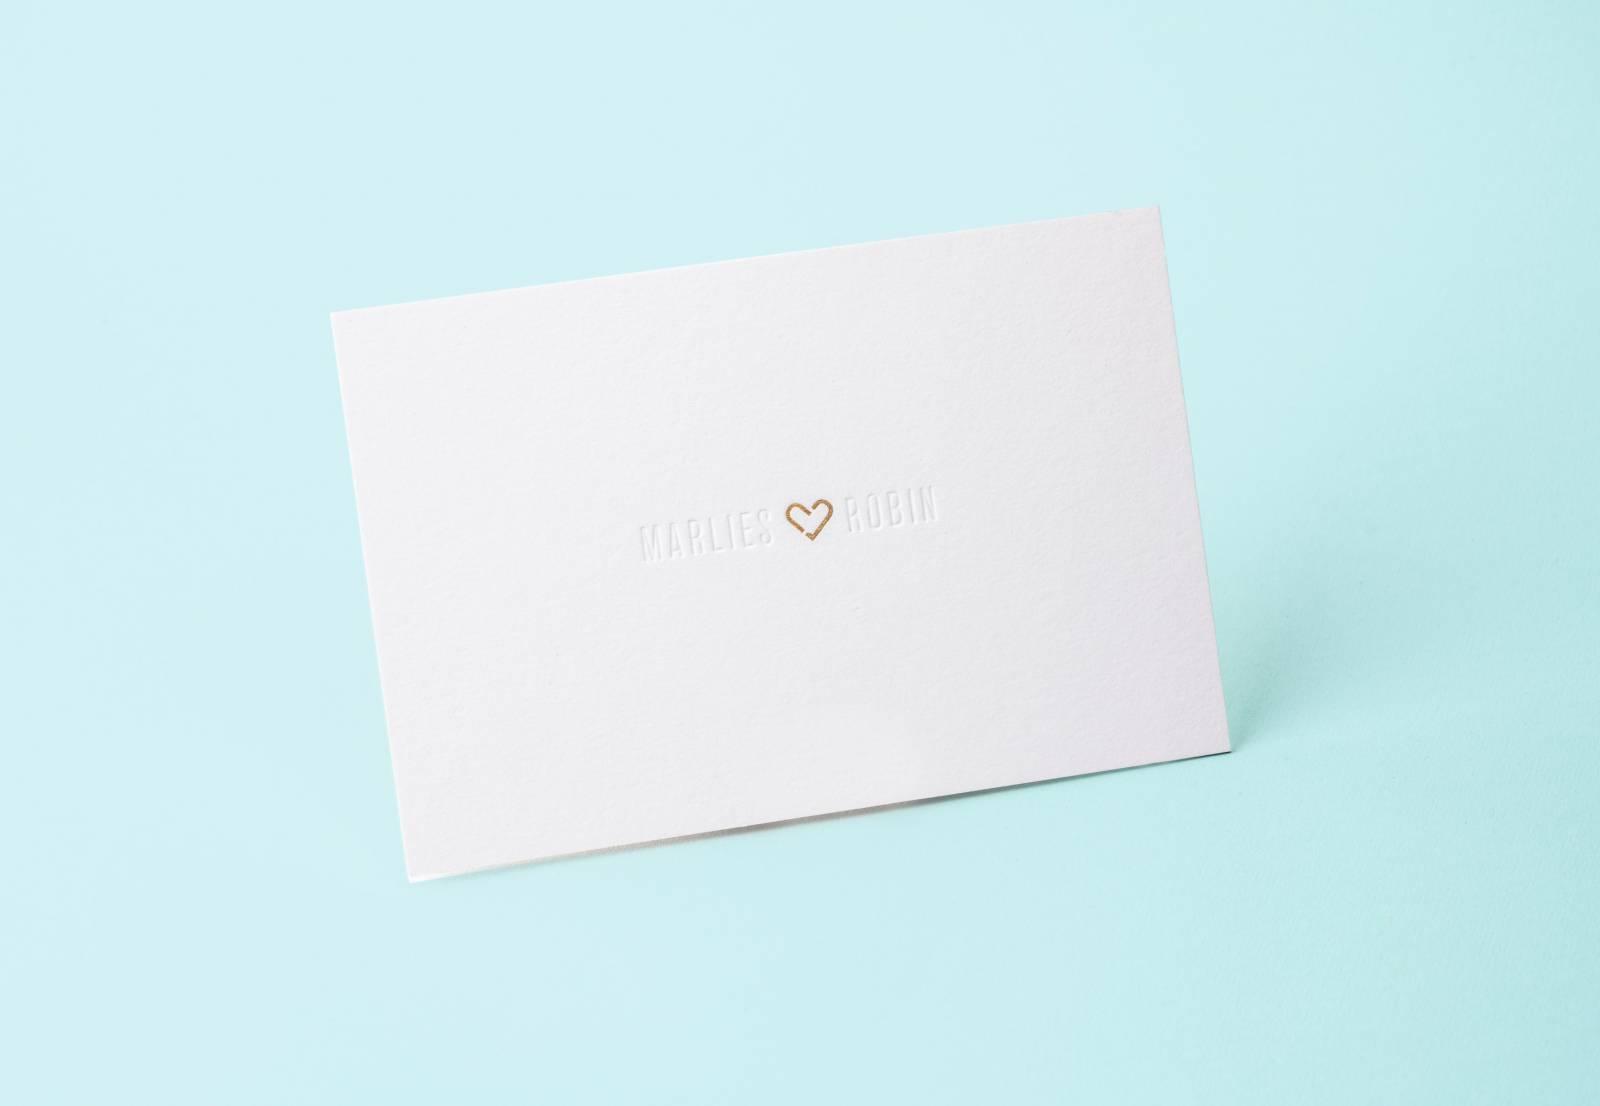 House of Weddings Uitgelijnd Drukwerk Uitnodiging Wedding Stationary Huwelijk Letterpress (6) (Custom)